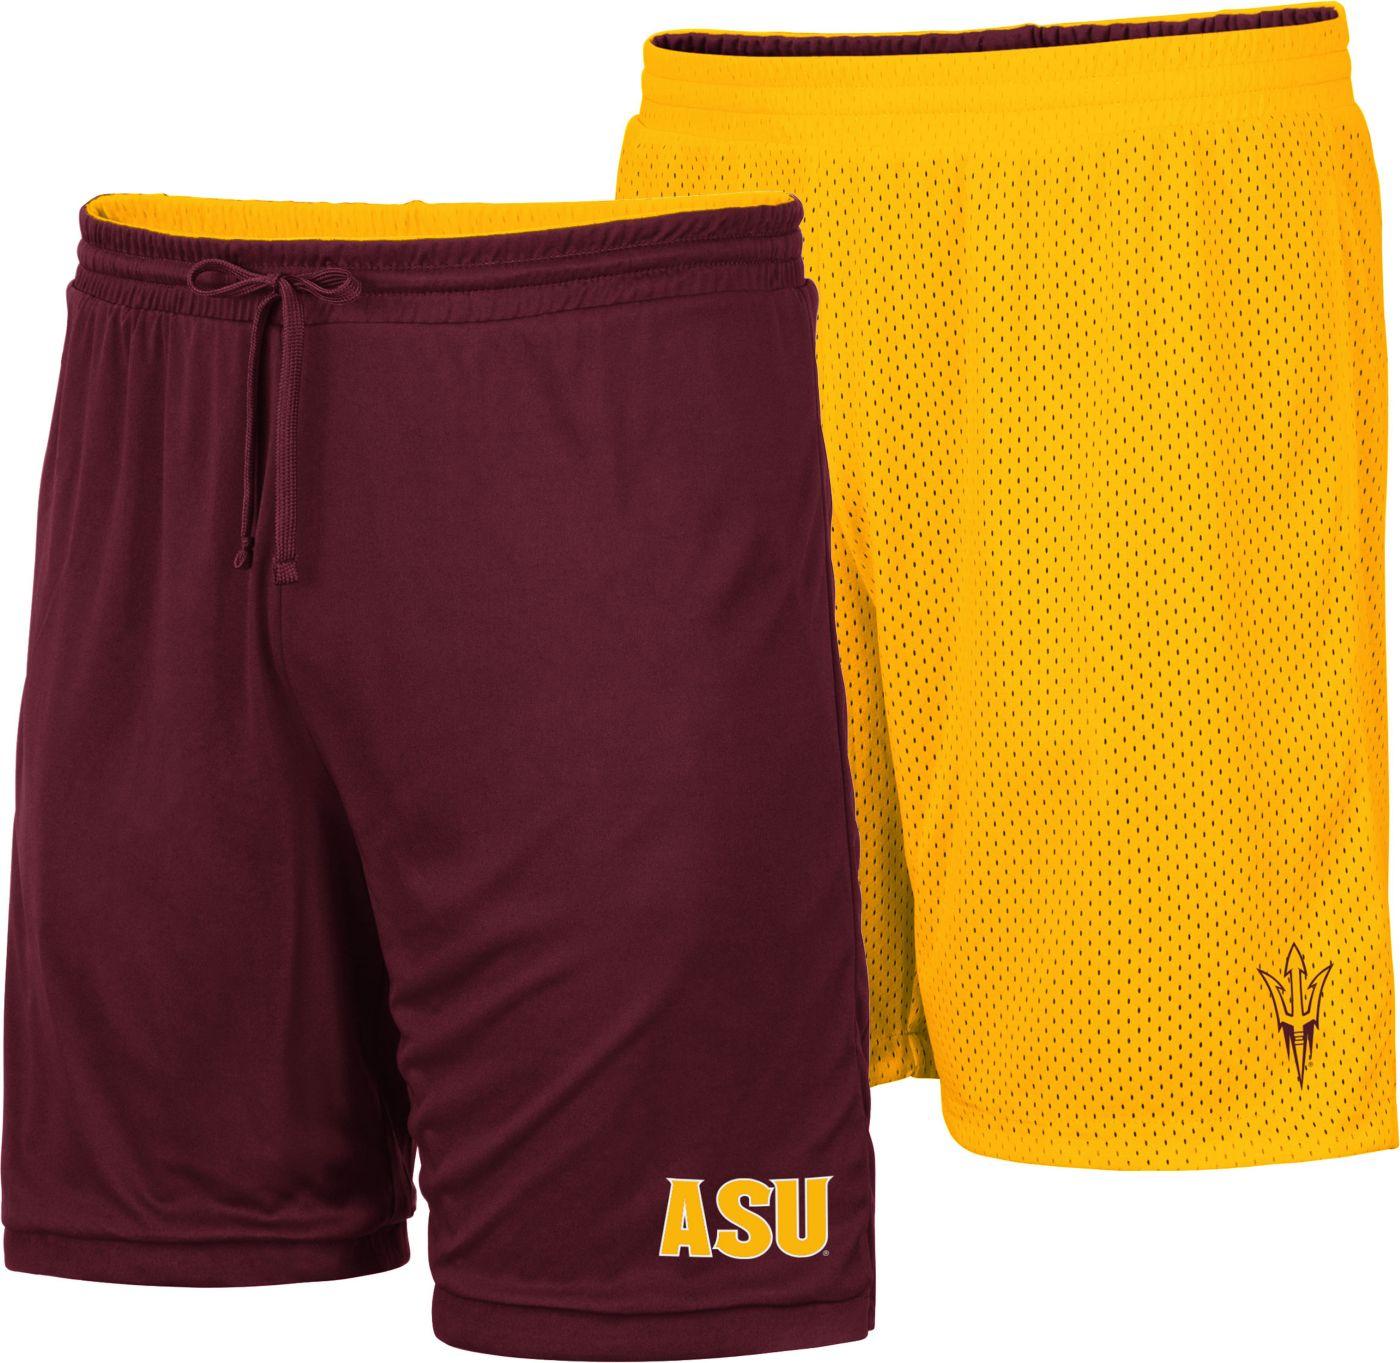 Colosseum Men's Arizona State Sun Devils Maroon/Gold Wiggum Reversible Shorts